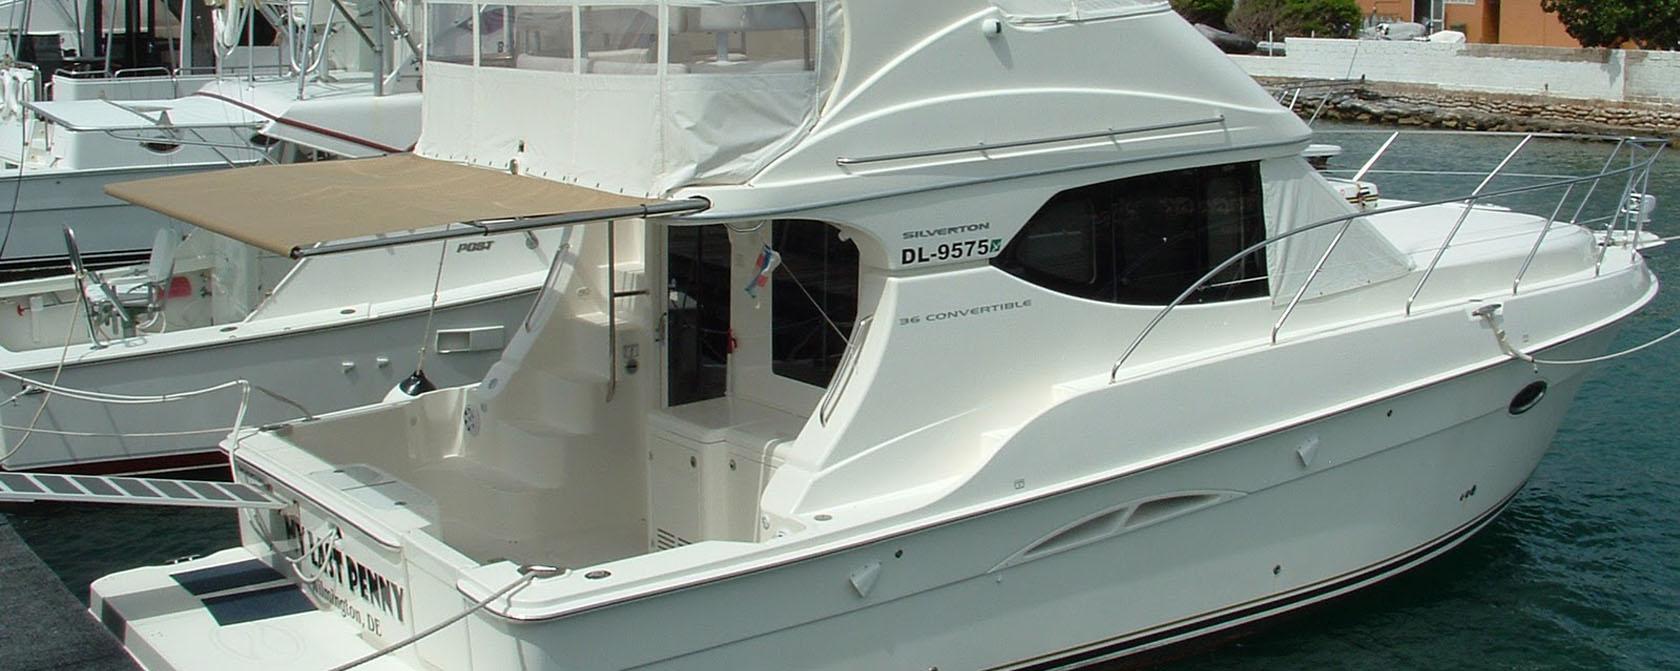 яхты Silverton